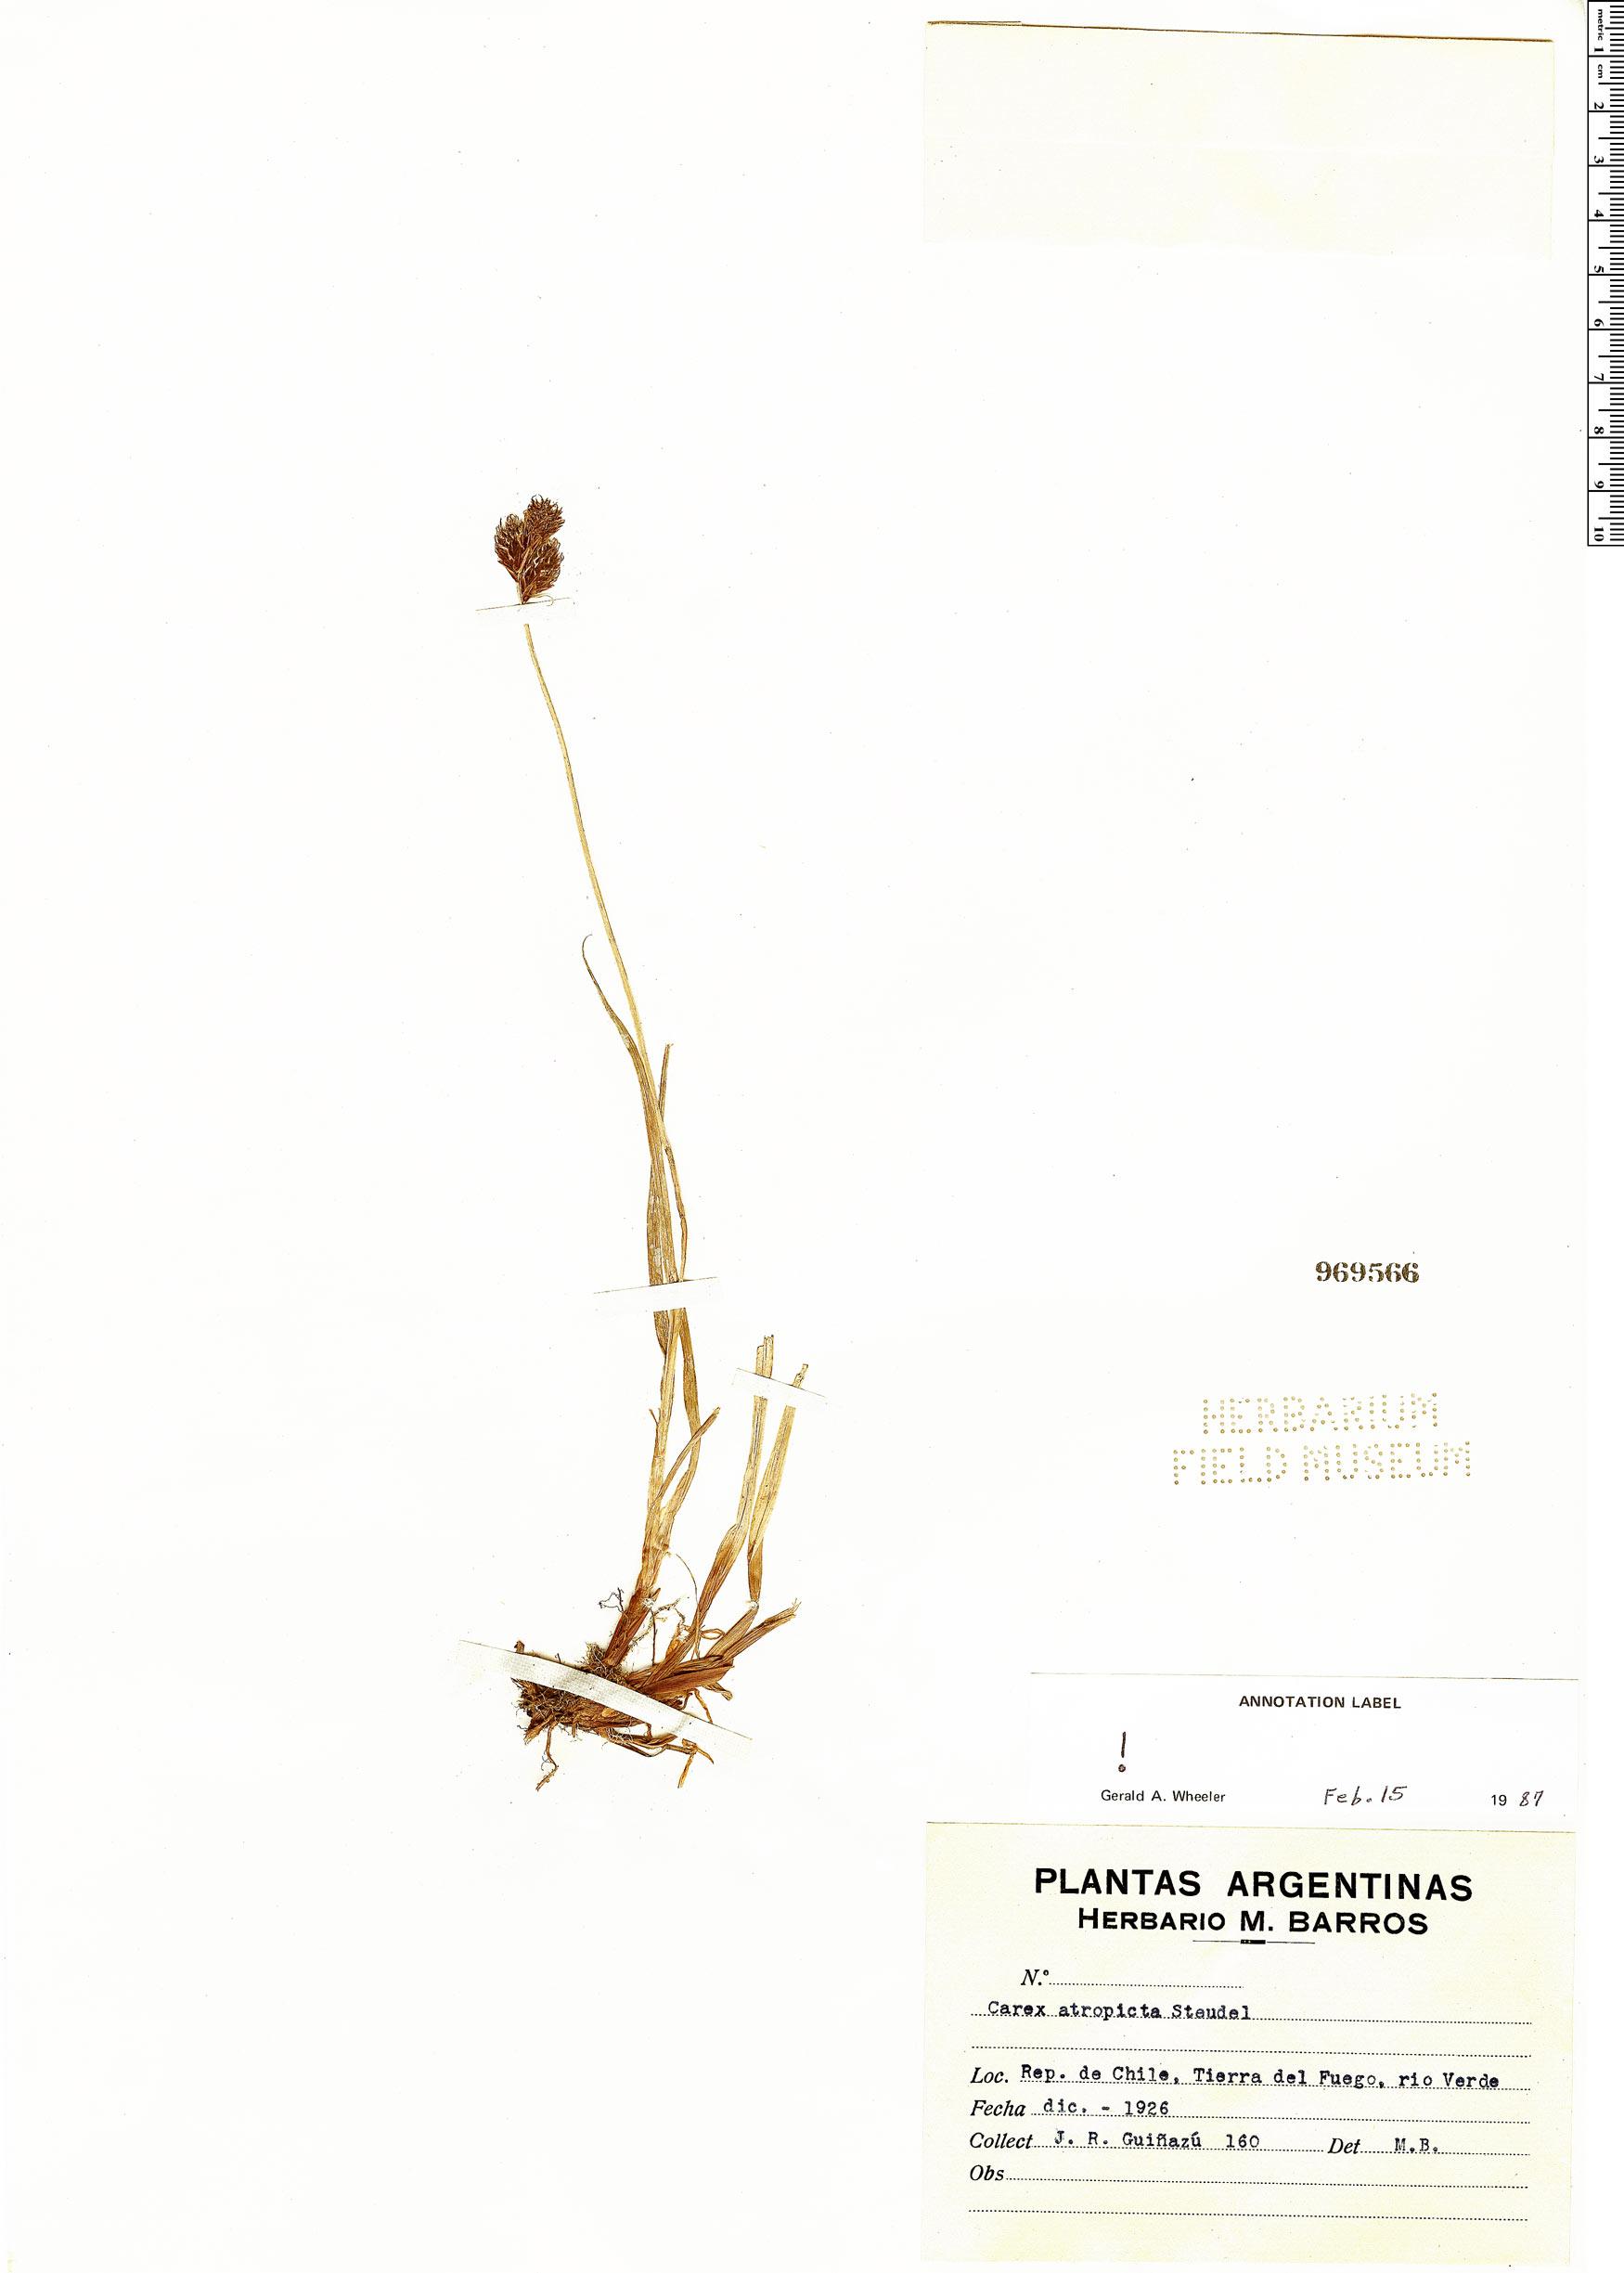 Carex atropicta image